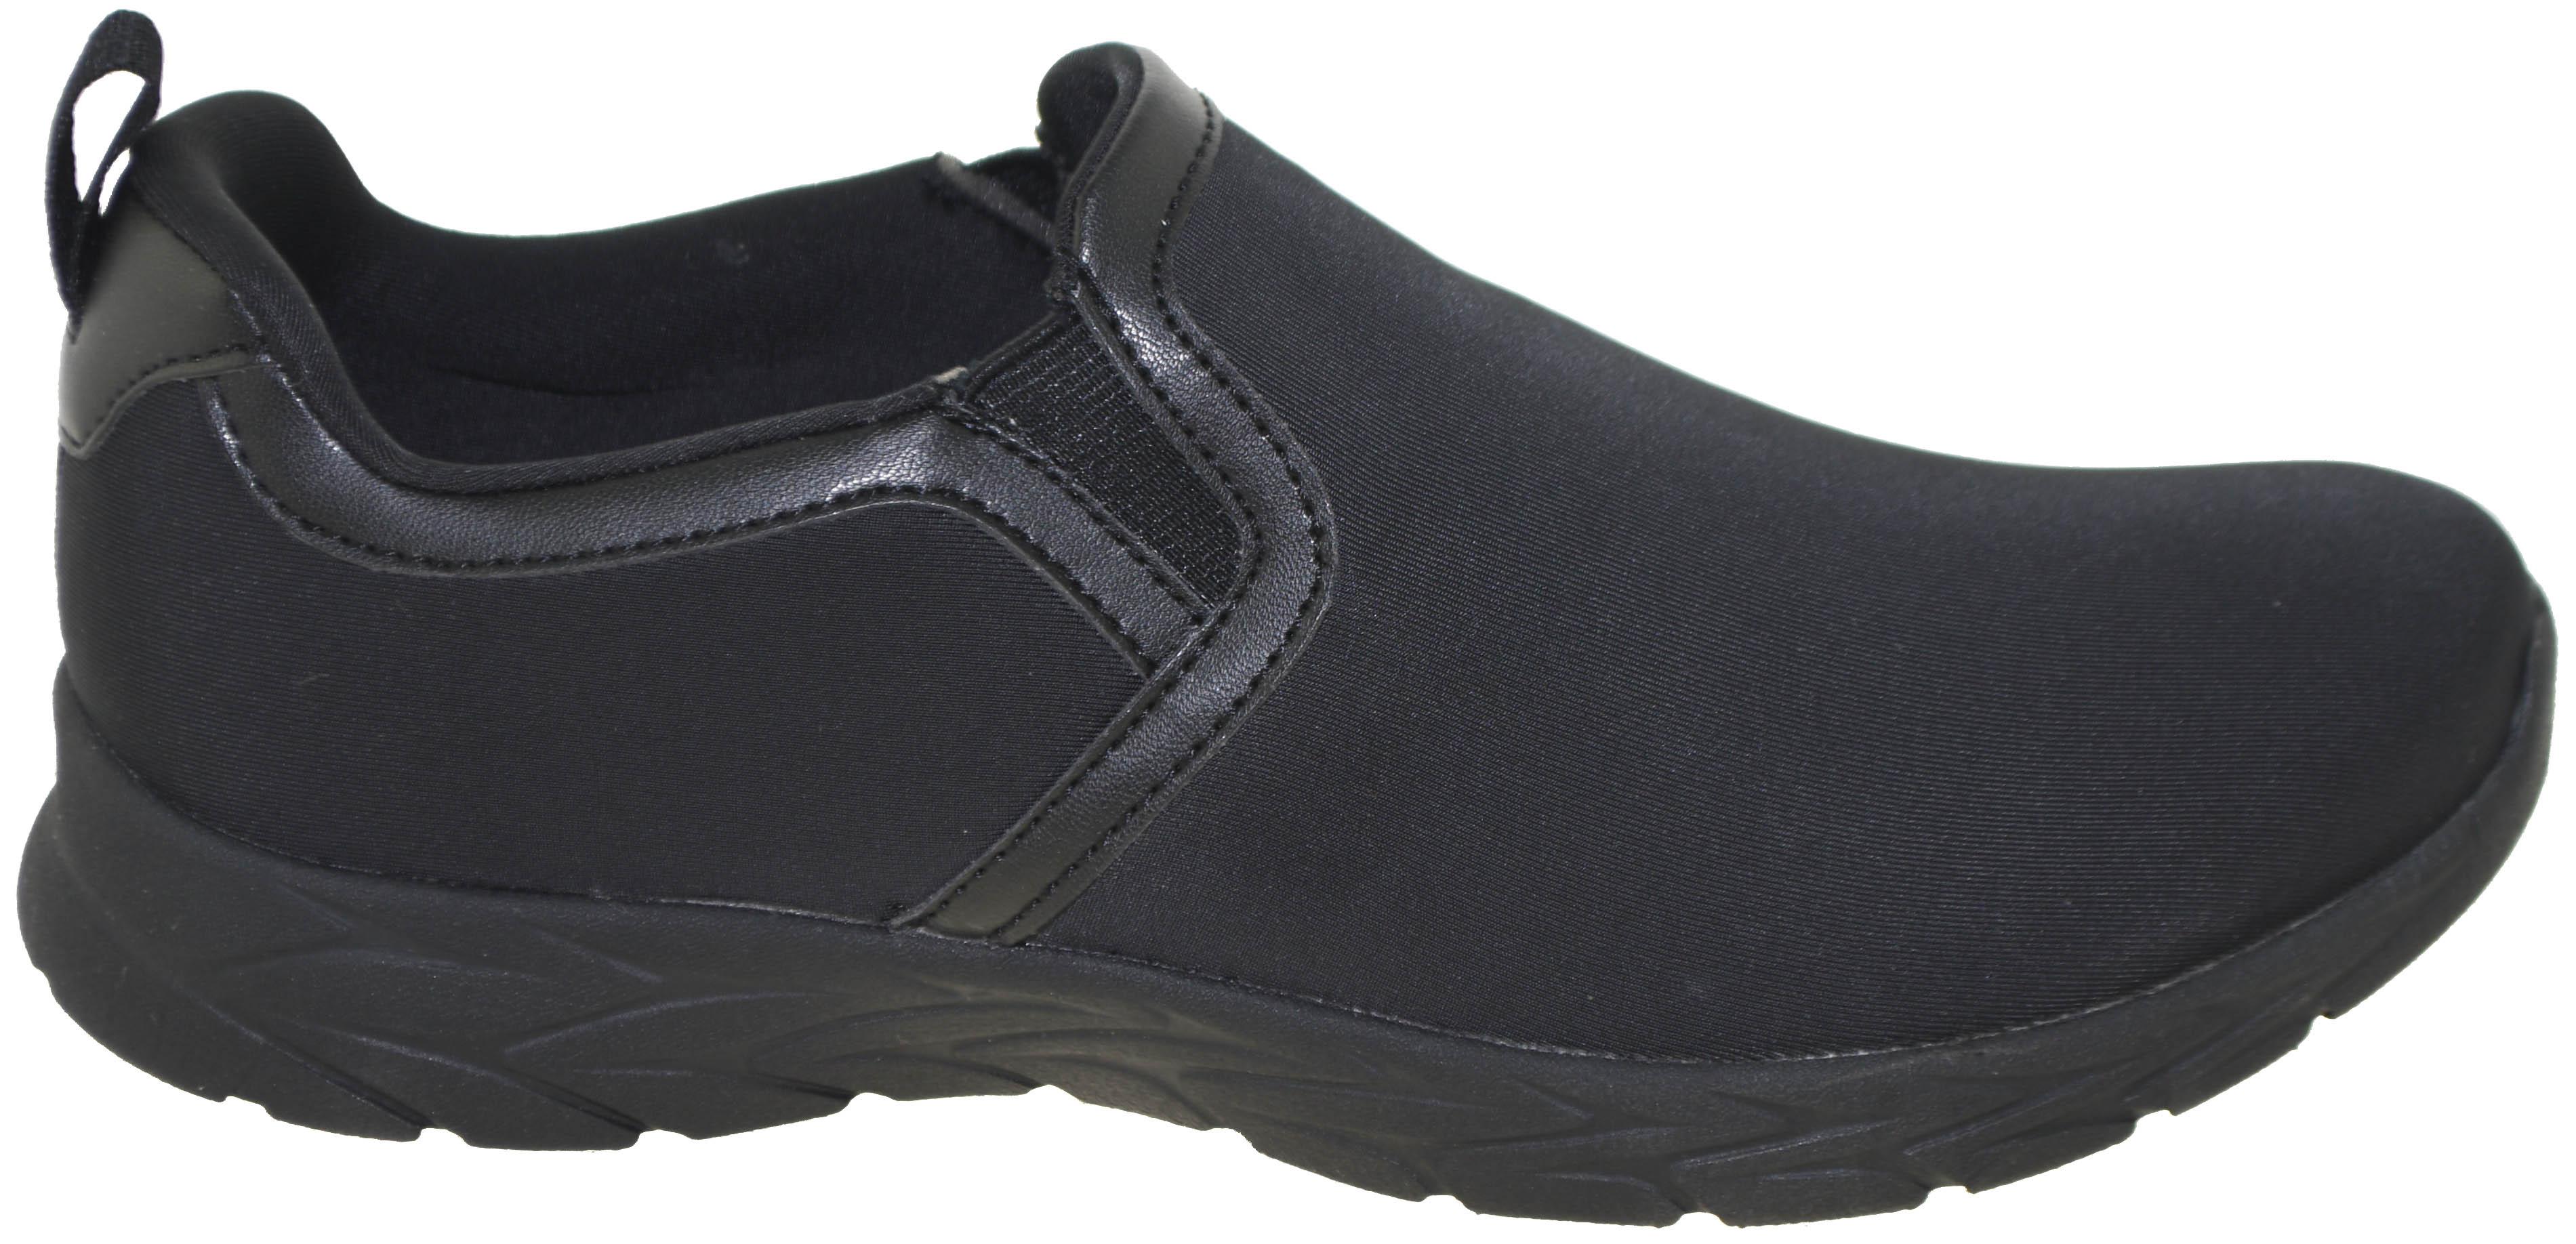 bc292b1f937a Details about Vionic Women s Brisk Blaine Slip-on Sneaker Black